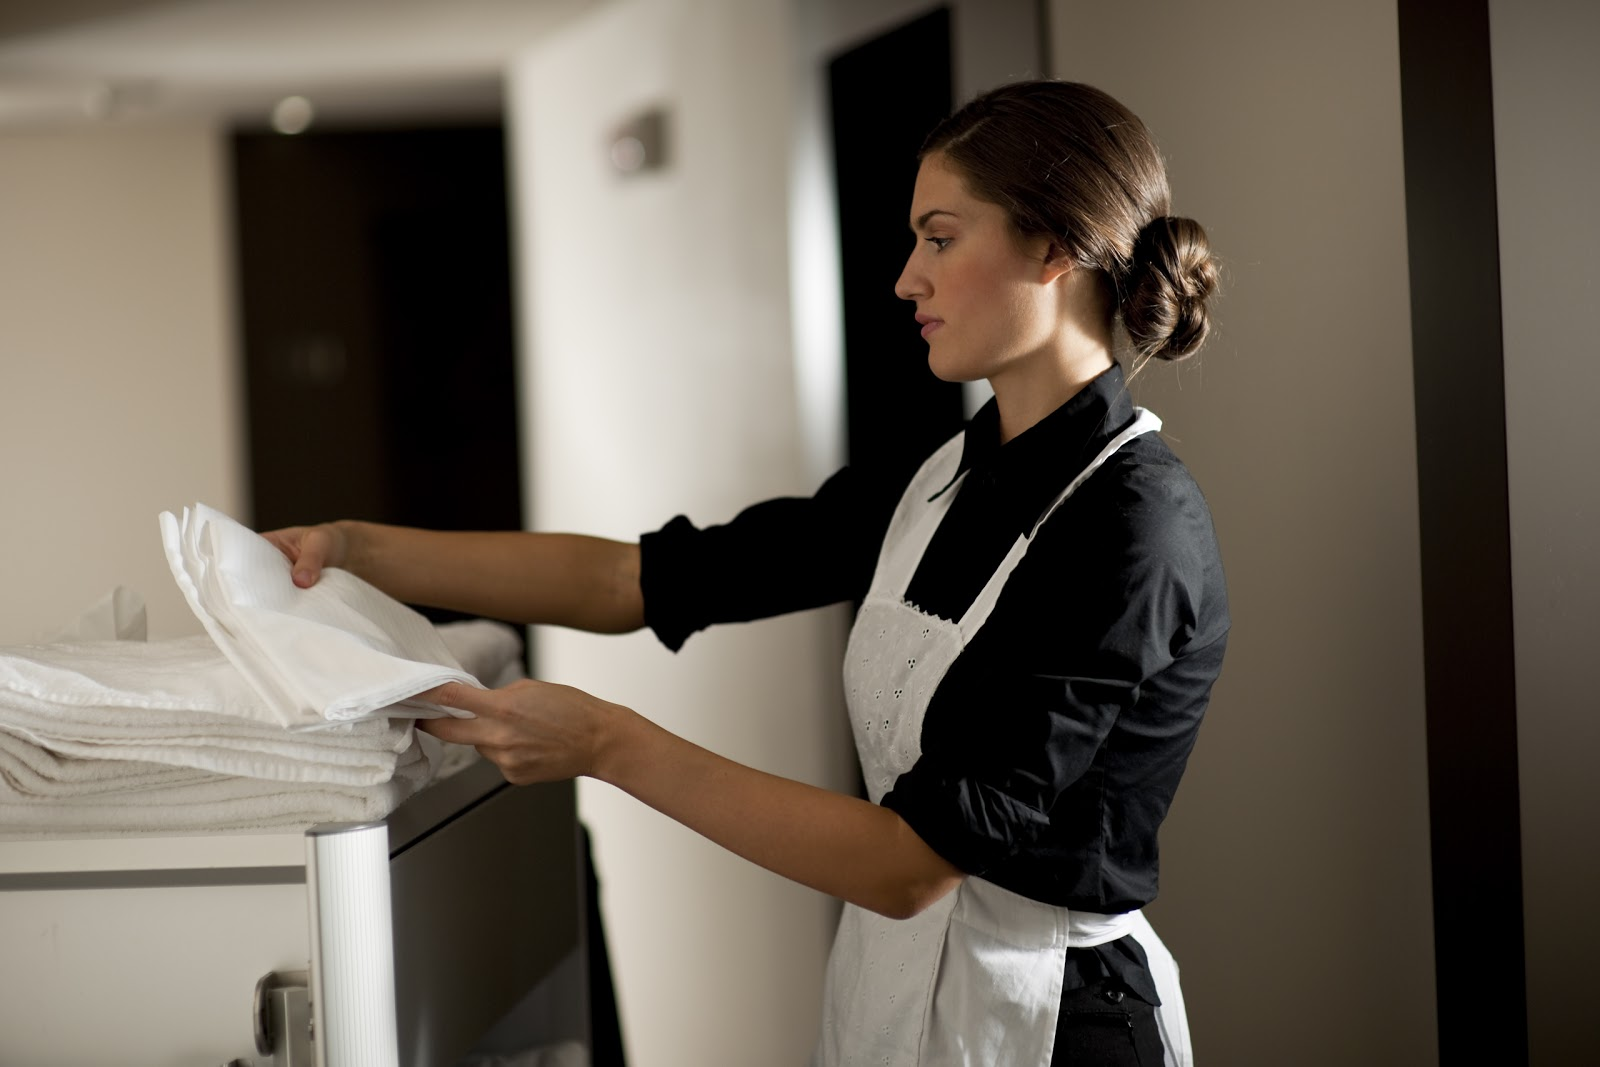 House maid the new job 3